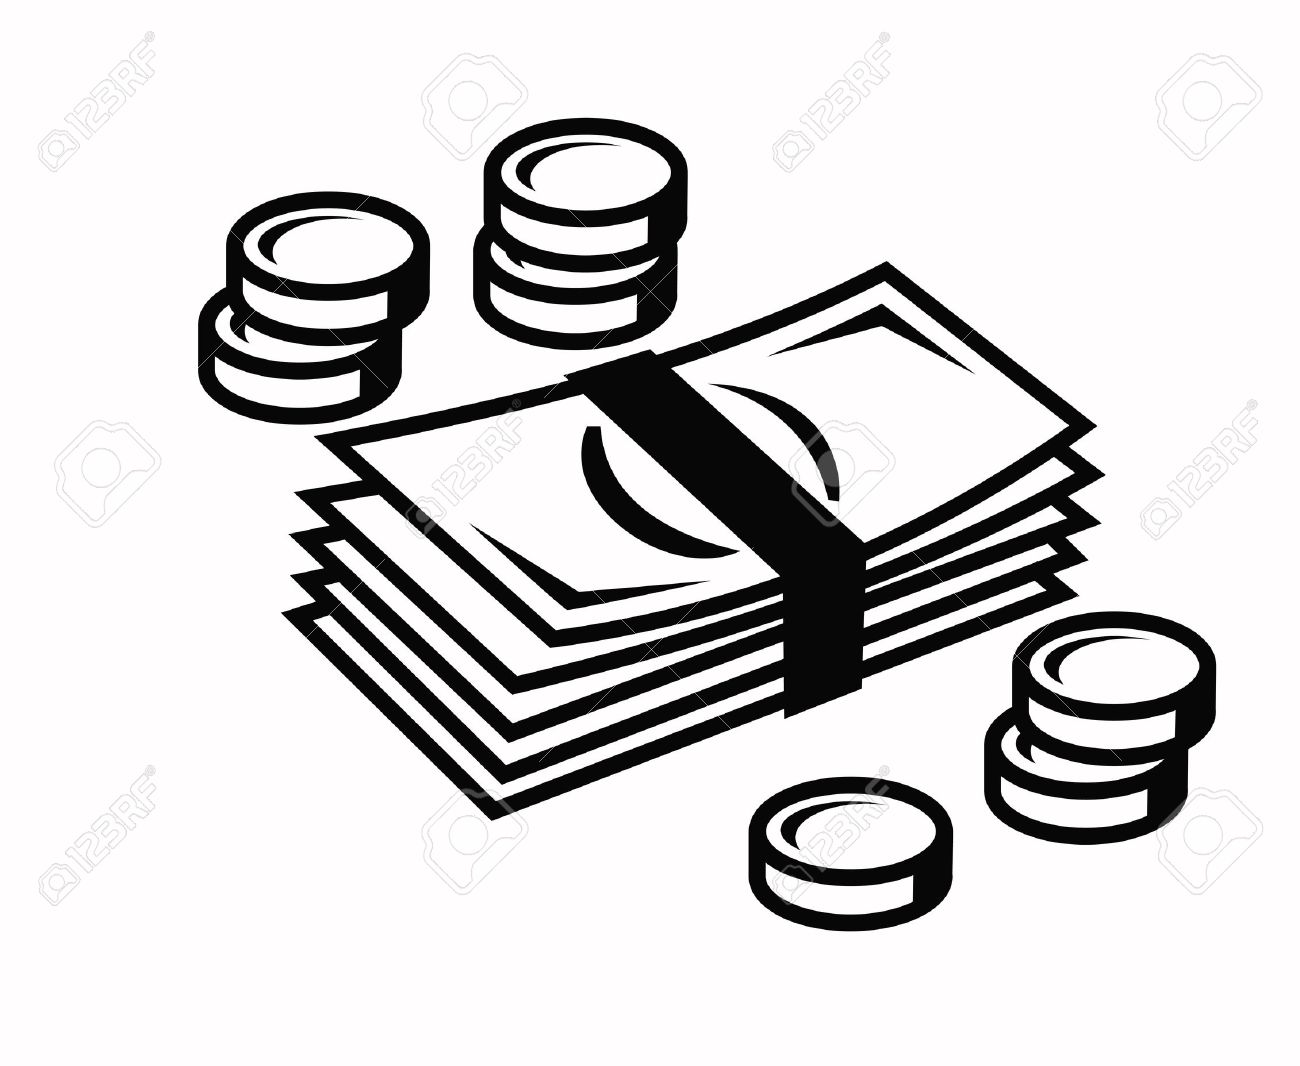 a8c358aa1cbff70b887f07ad4e6dd8a9_bills-clipart-black-and-white-money-bills-clipart-black-and-white_259-240.png